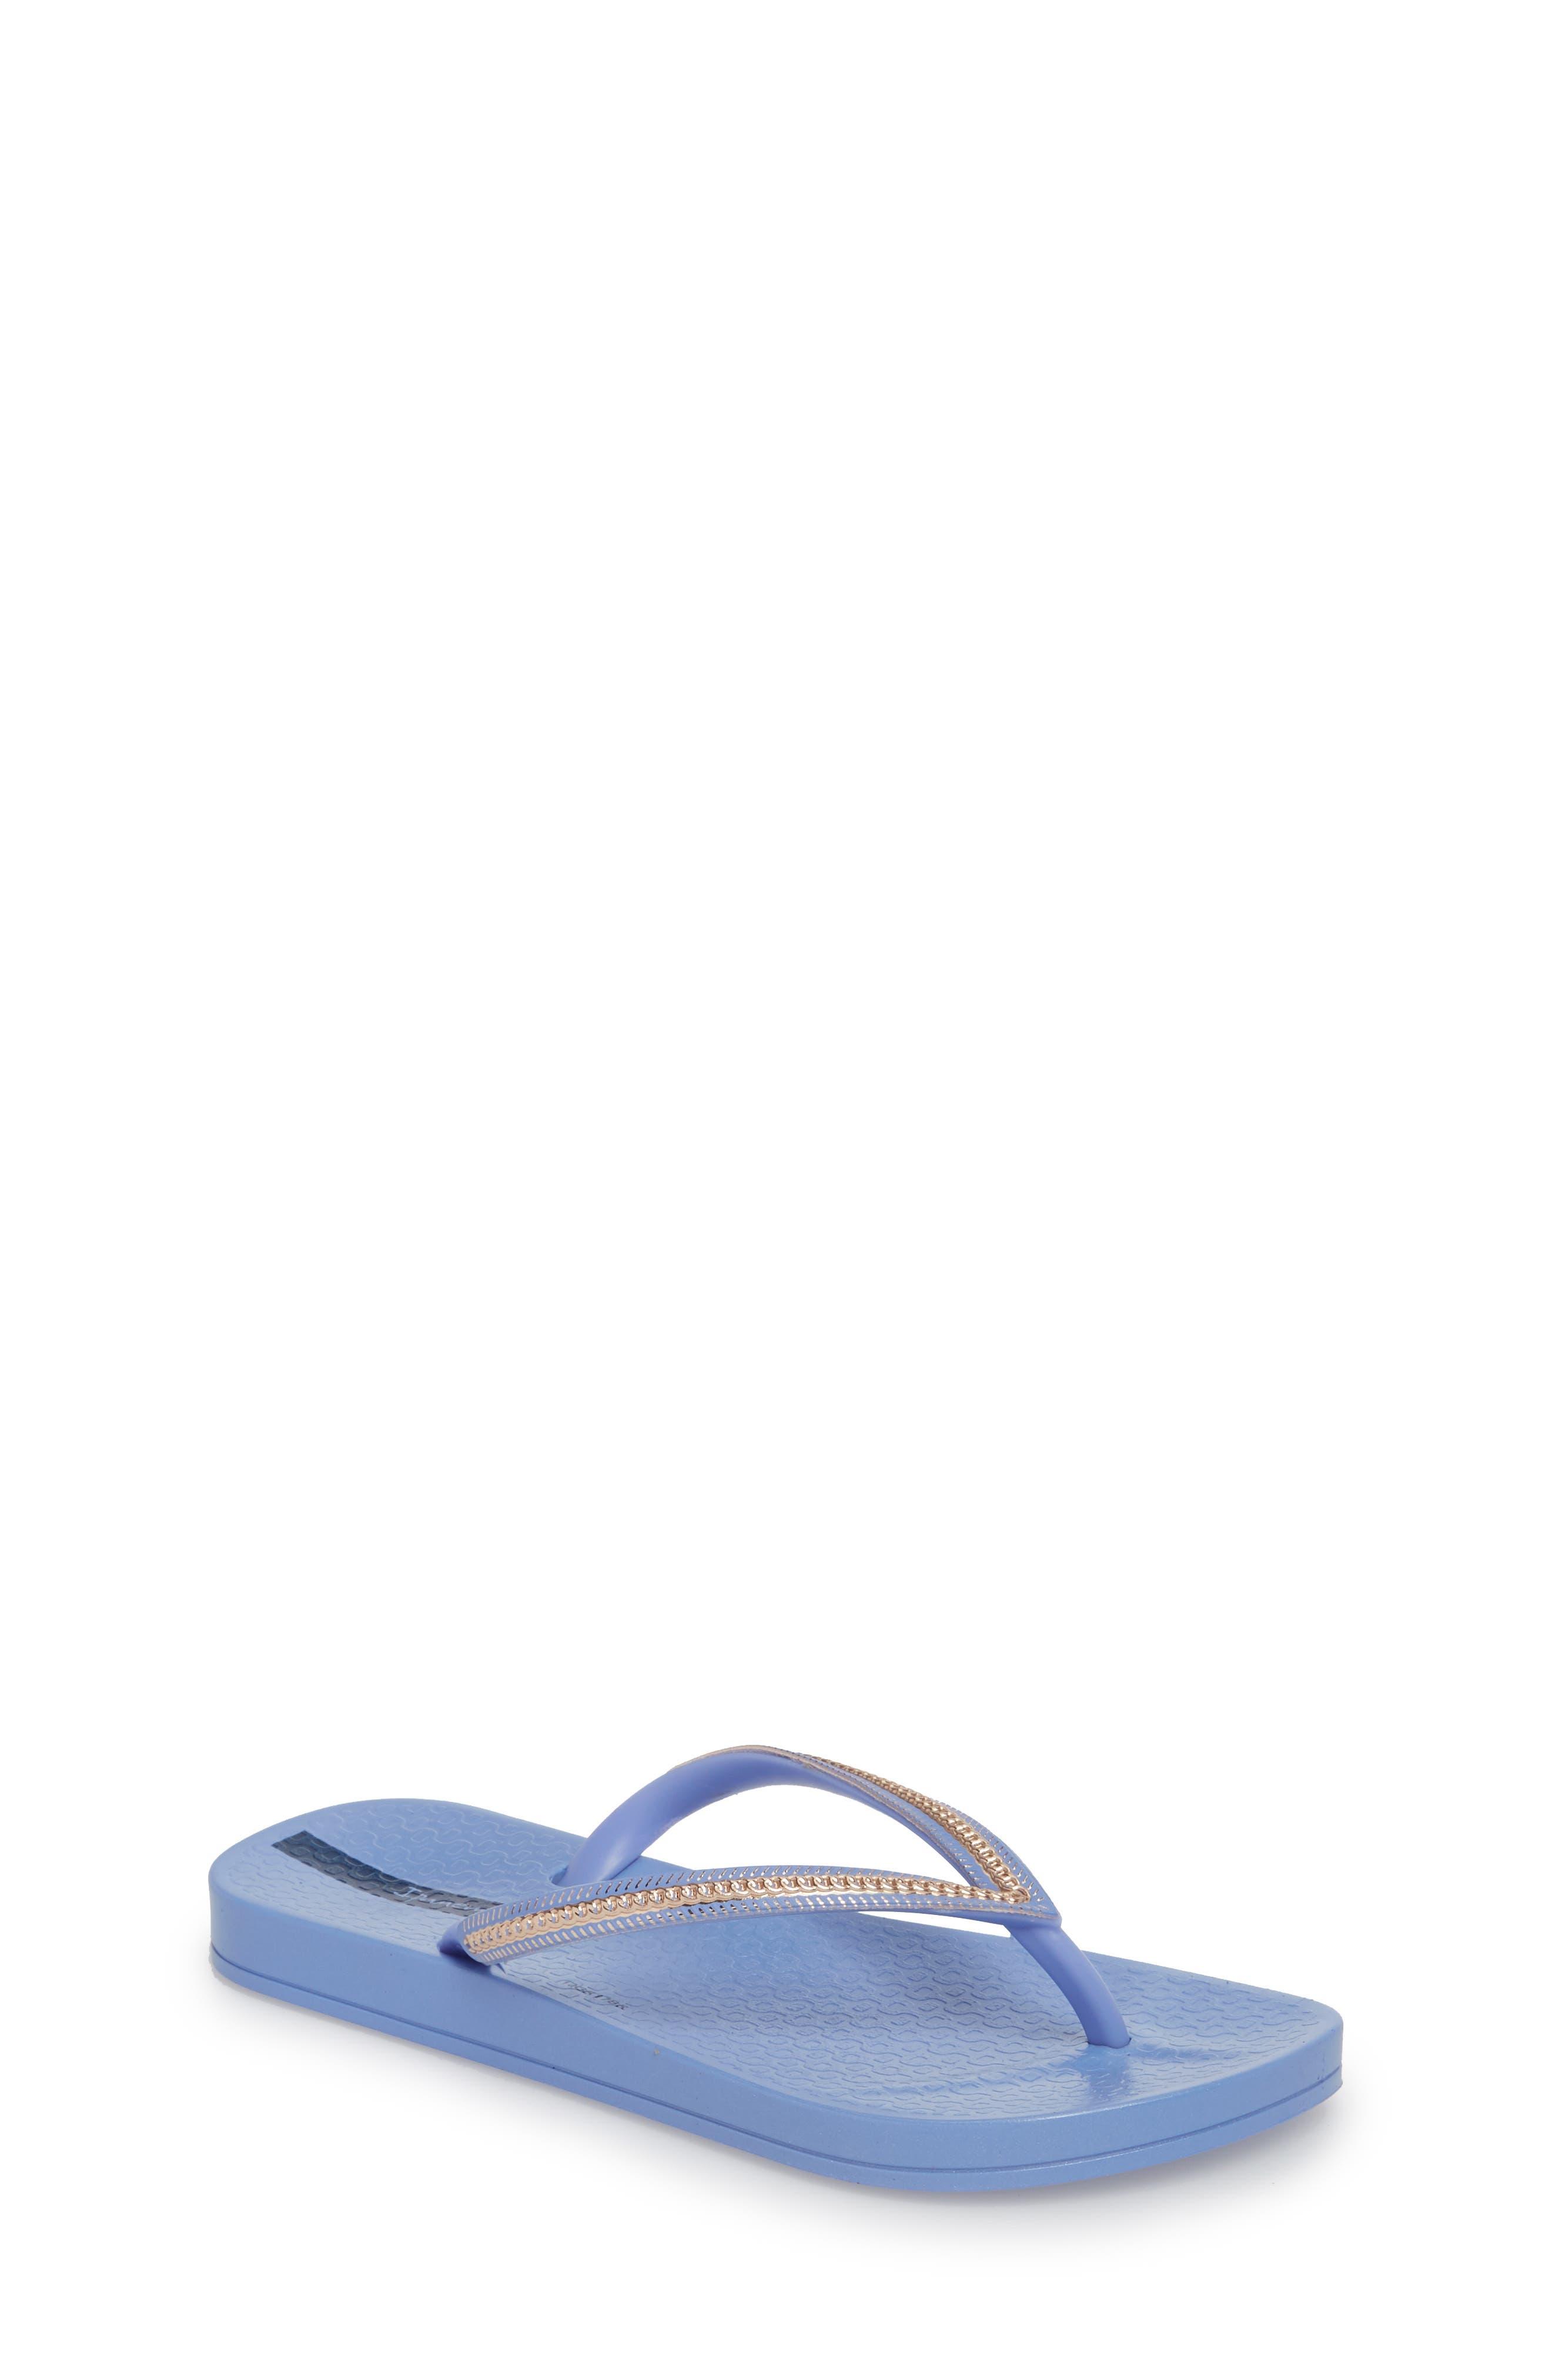 Ana Metallic Flip Flop,                         Main,                         color,